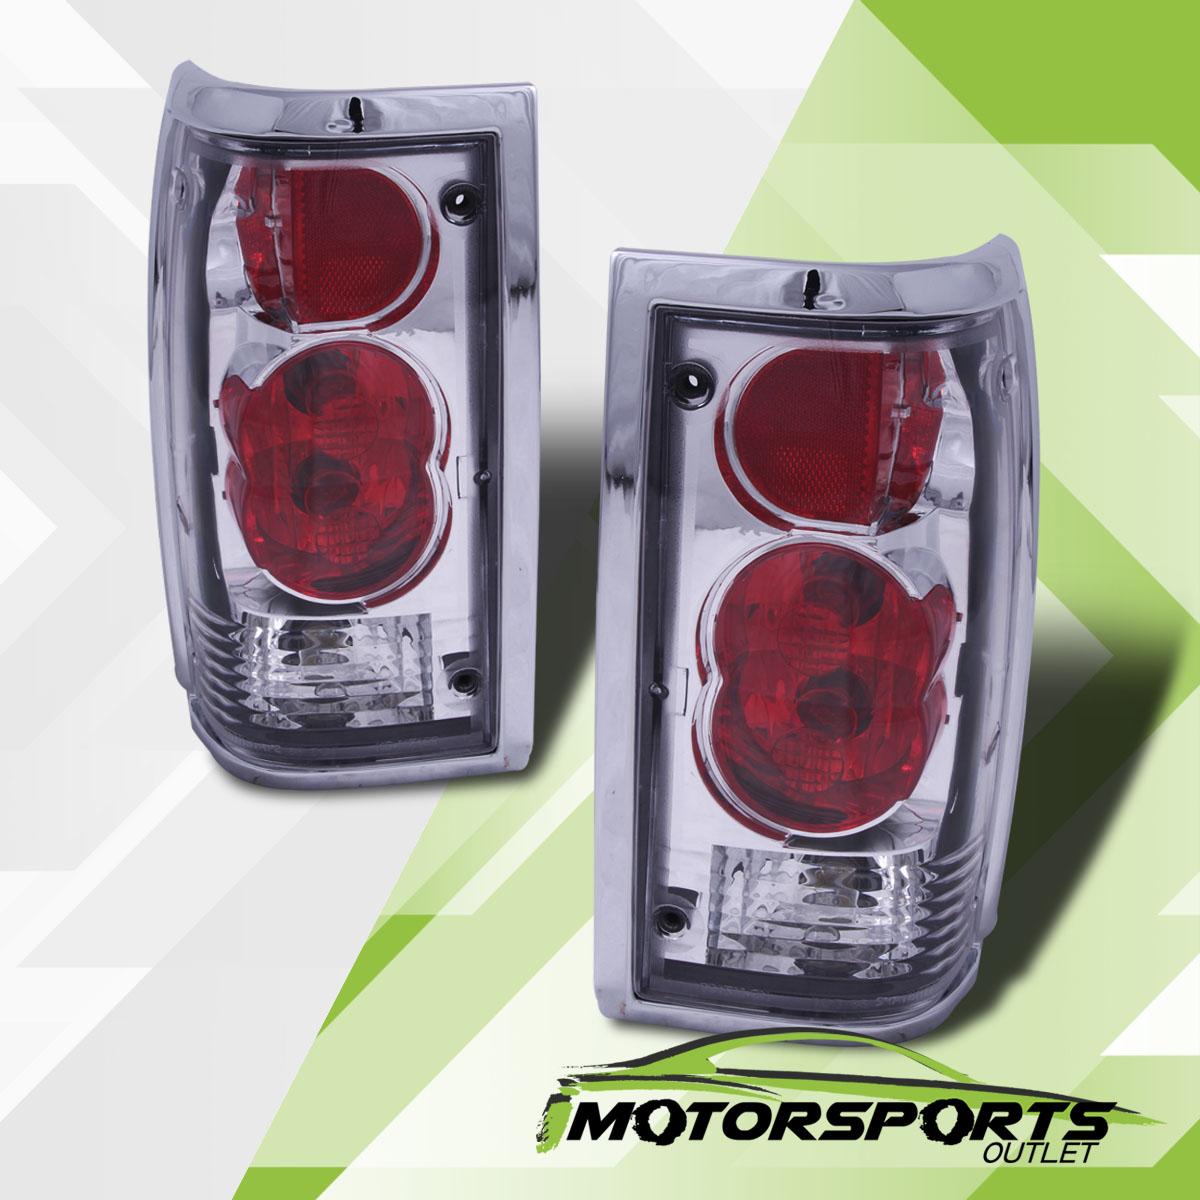 1986 1987 1988 1989 1990 1991 1992 1993 Mazda B2000/B2200/B2600 Pickup  Truck Model Only